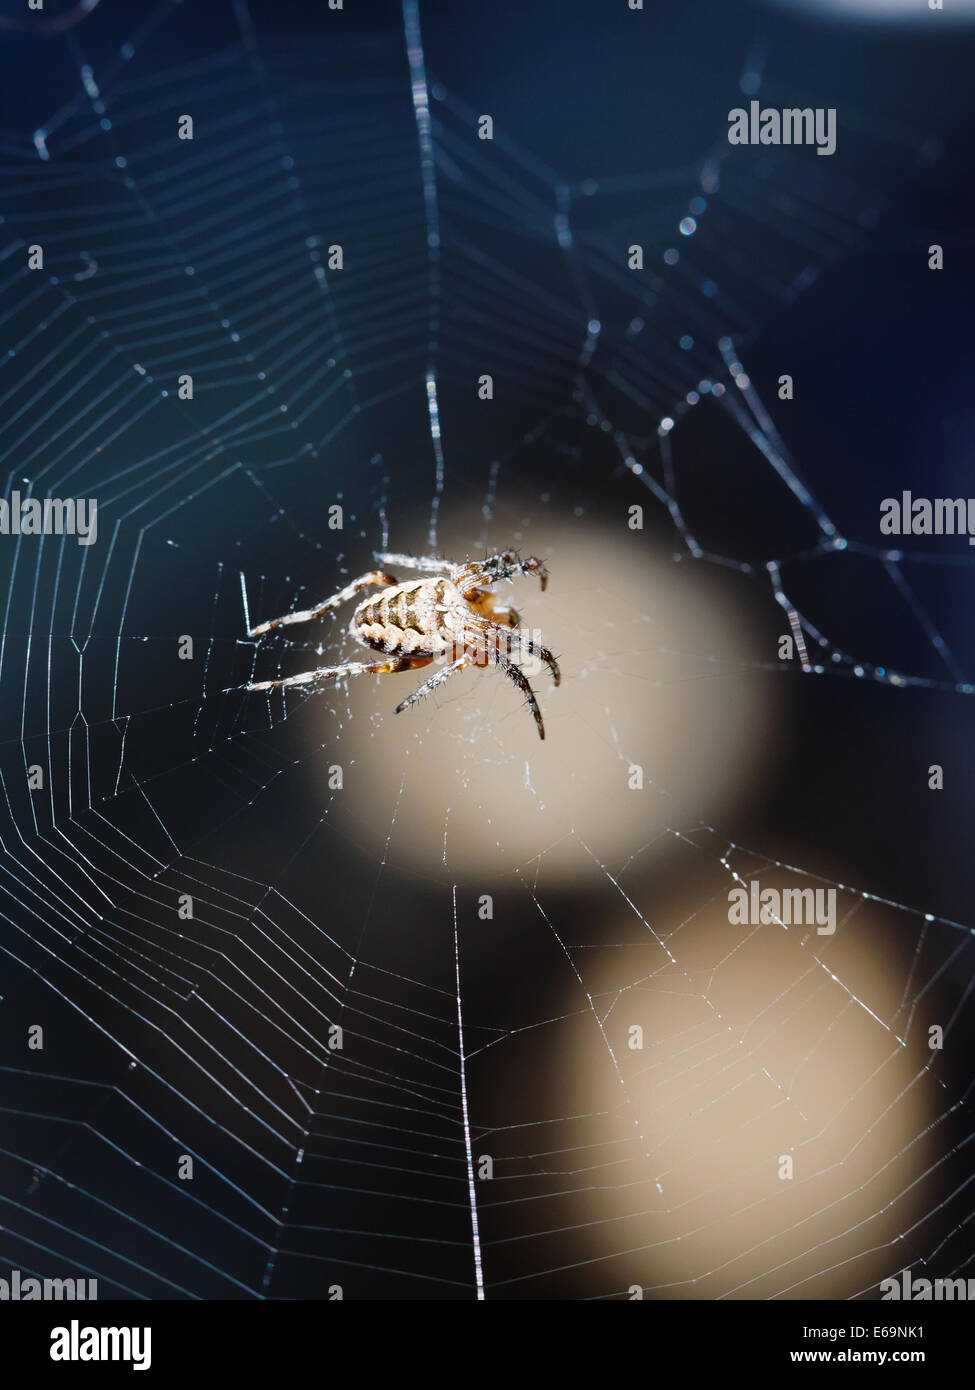 female European garden spider on spiderweb close up outdoors - Stock Image